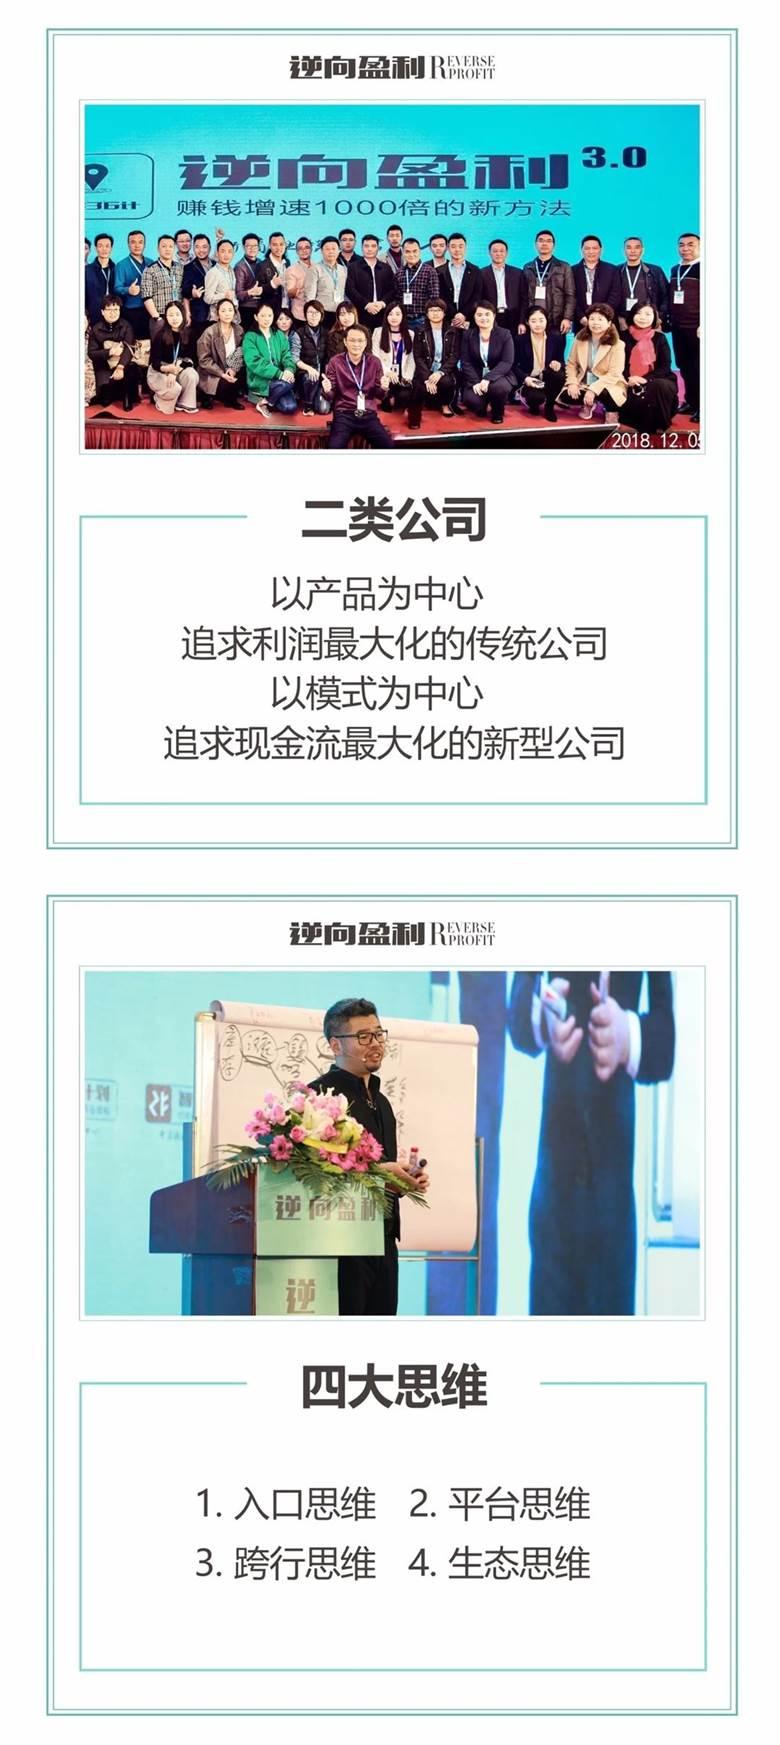 http://www.huodongxing.com/file/20191113/1063603644976/643659461817090.jpg